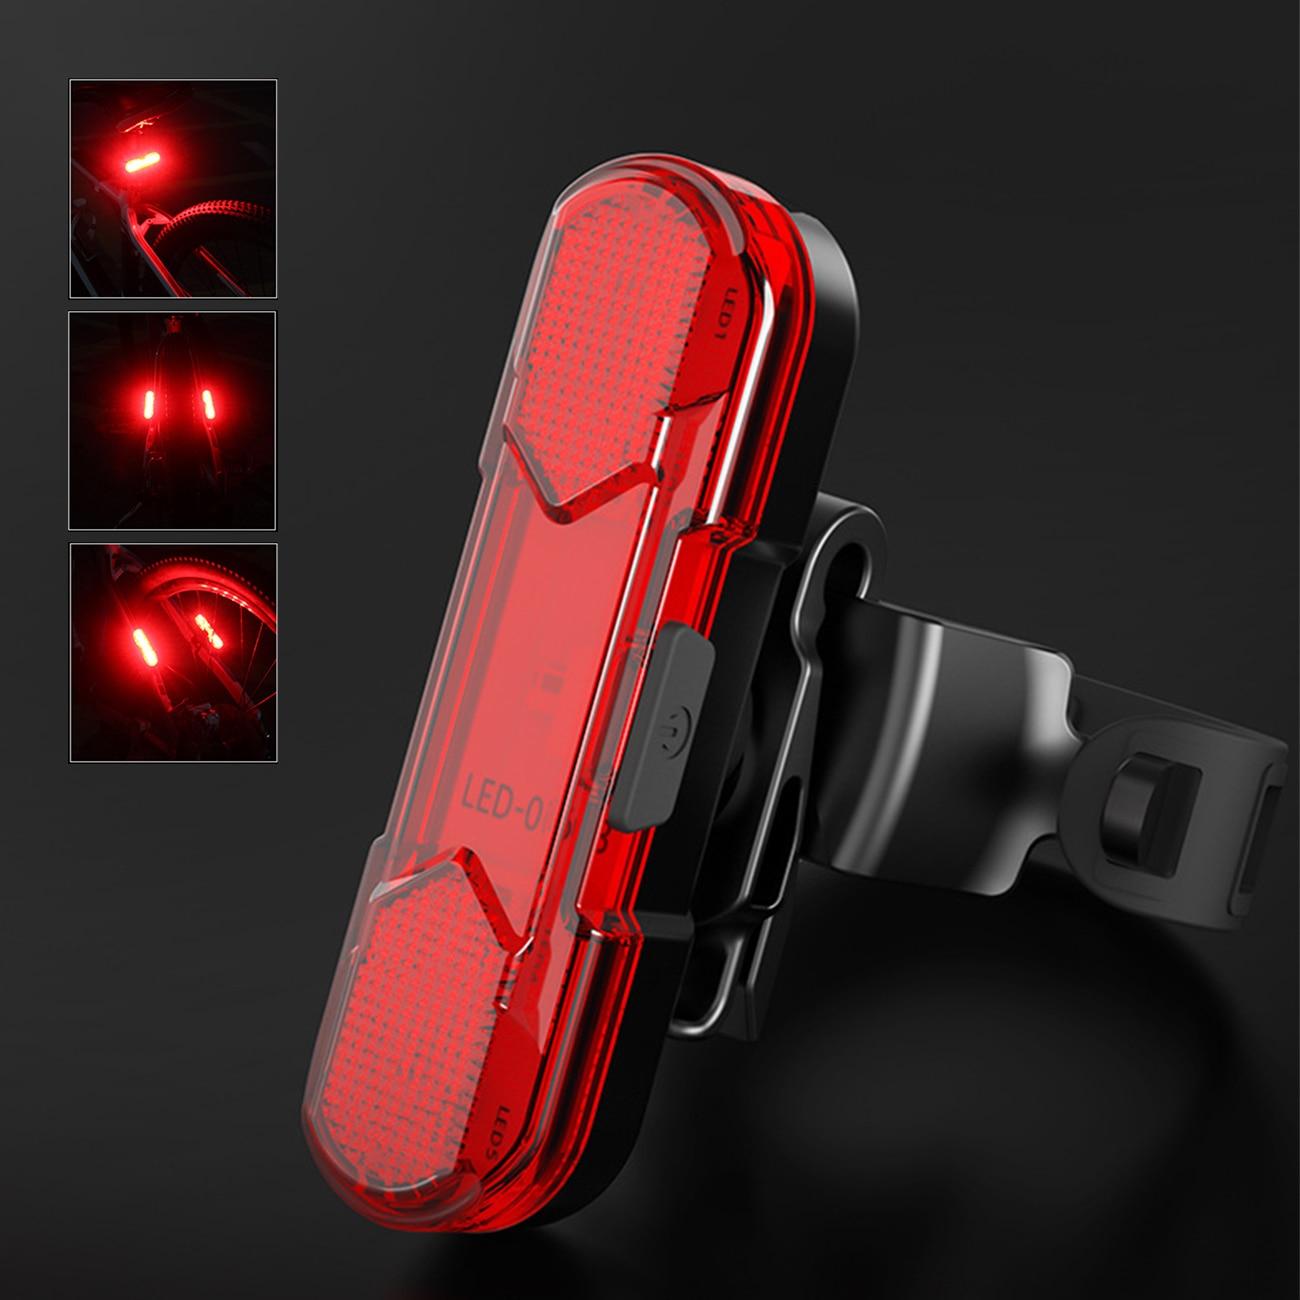 LED Warning Lights Night Bike Rear Light MTB Bike Equipment Bicycle USB Charging Shine Smart Auto Br